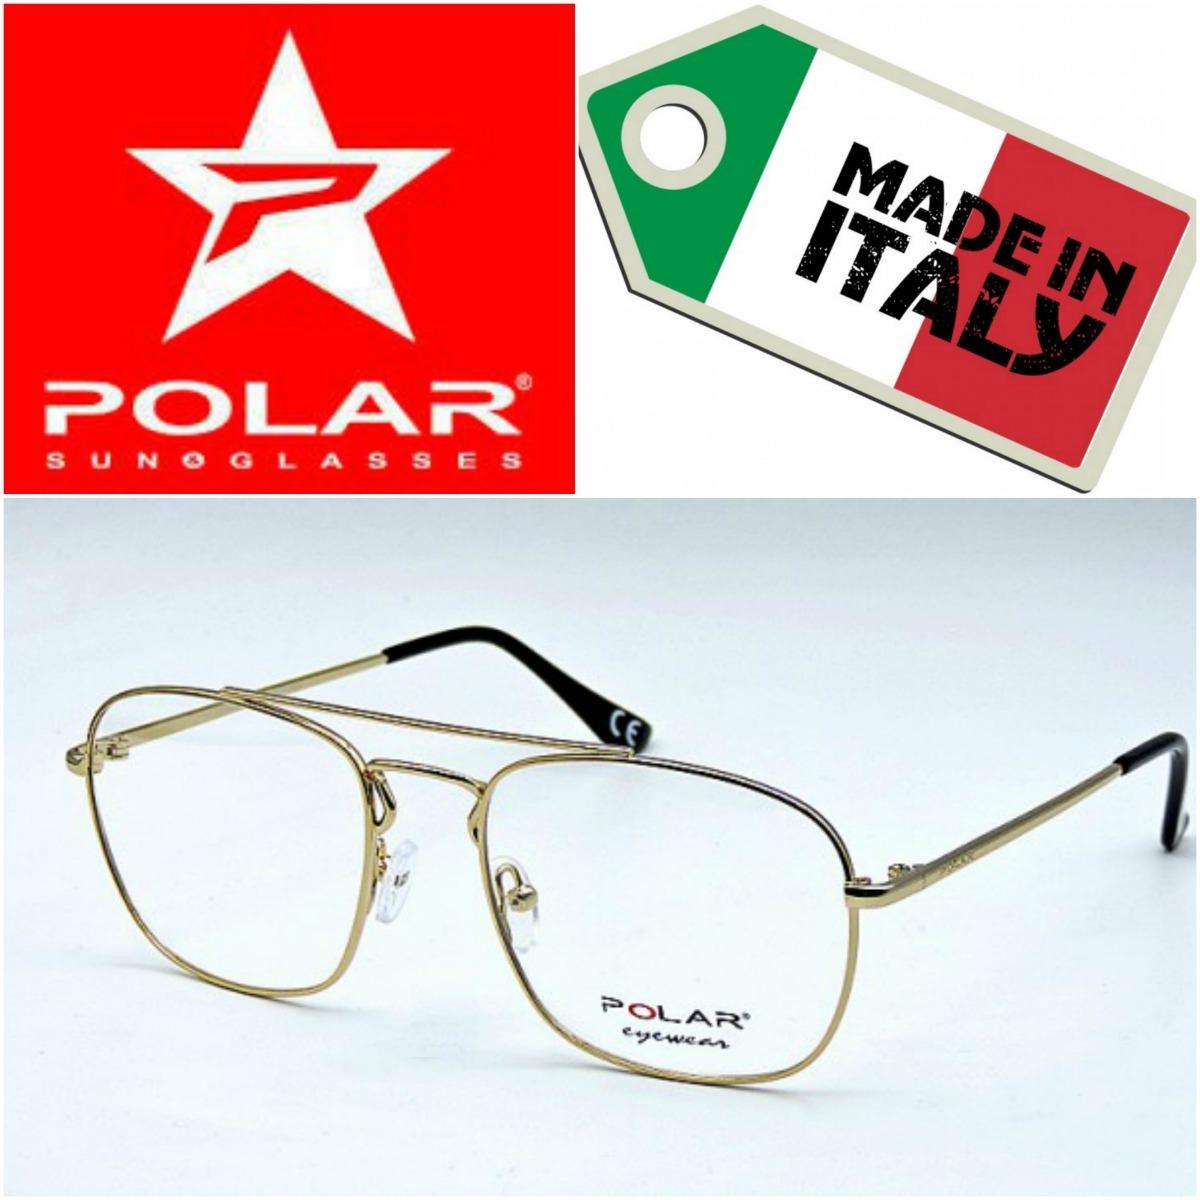 44895f5eeb montura para gafas lentes formulados, marca polar, italiana. Cargando zoom.